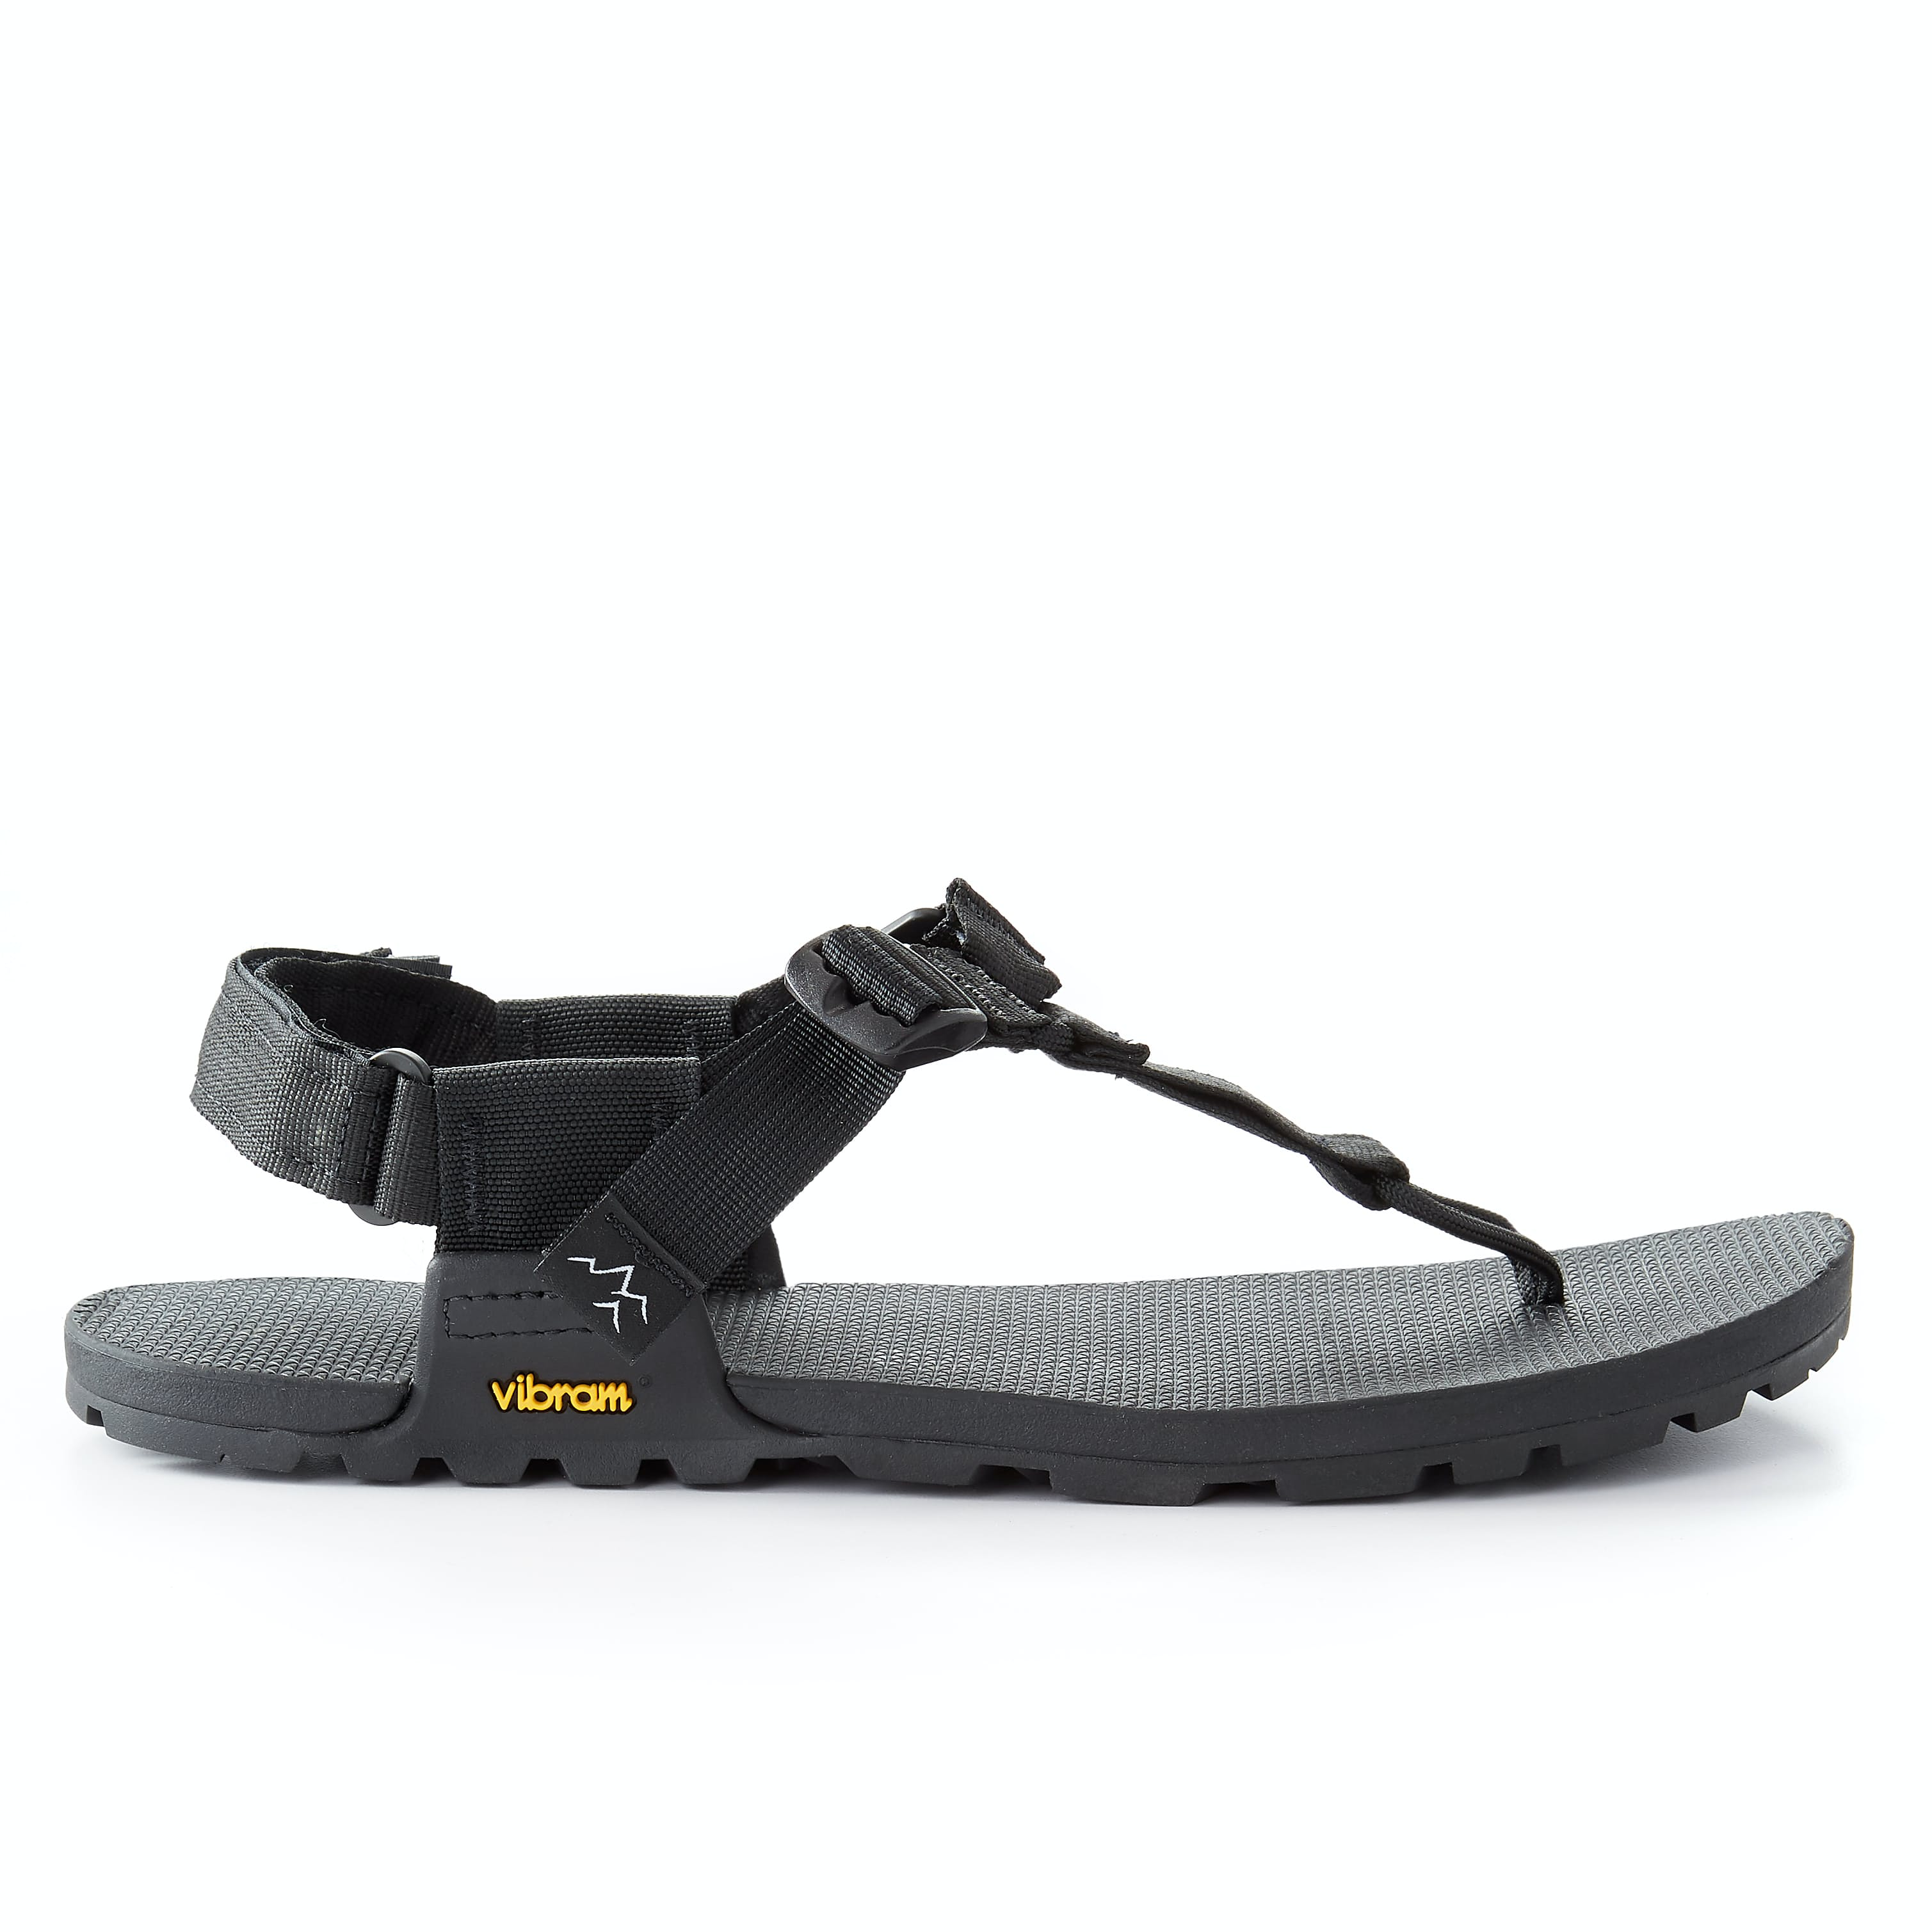 Pdqufdy8vq bedrock sandals cairn 0 original